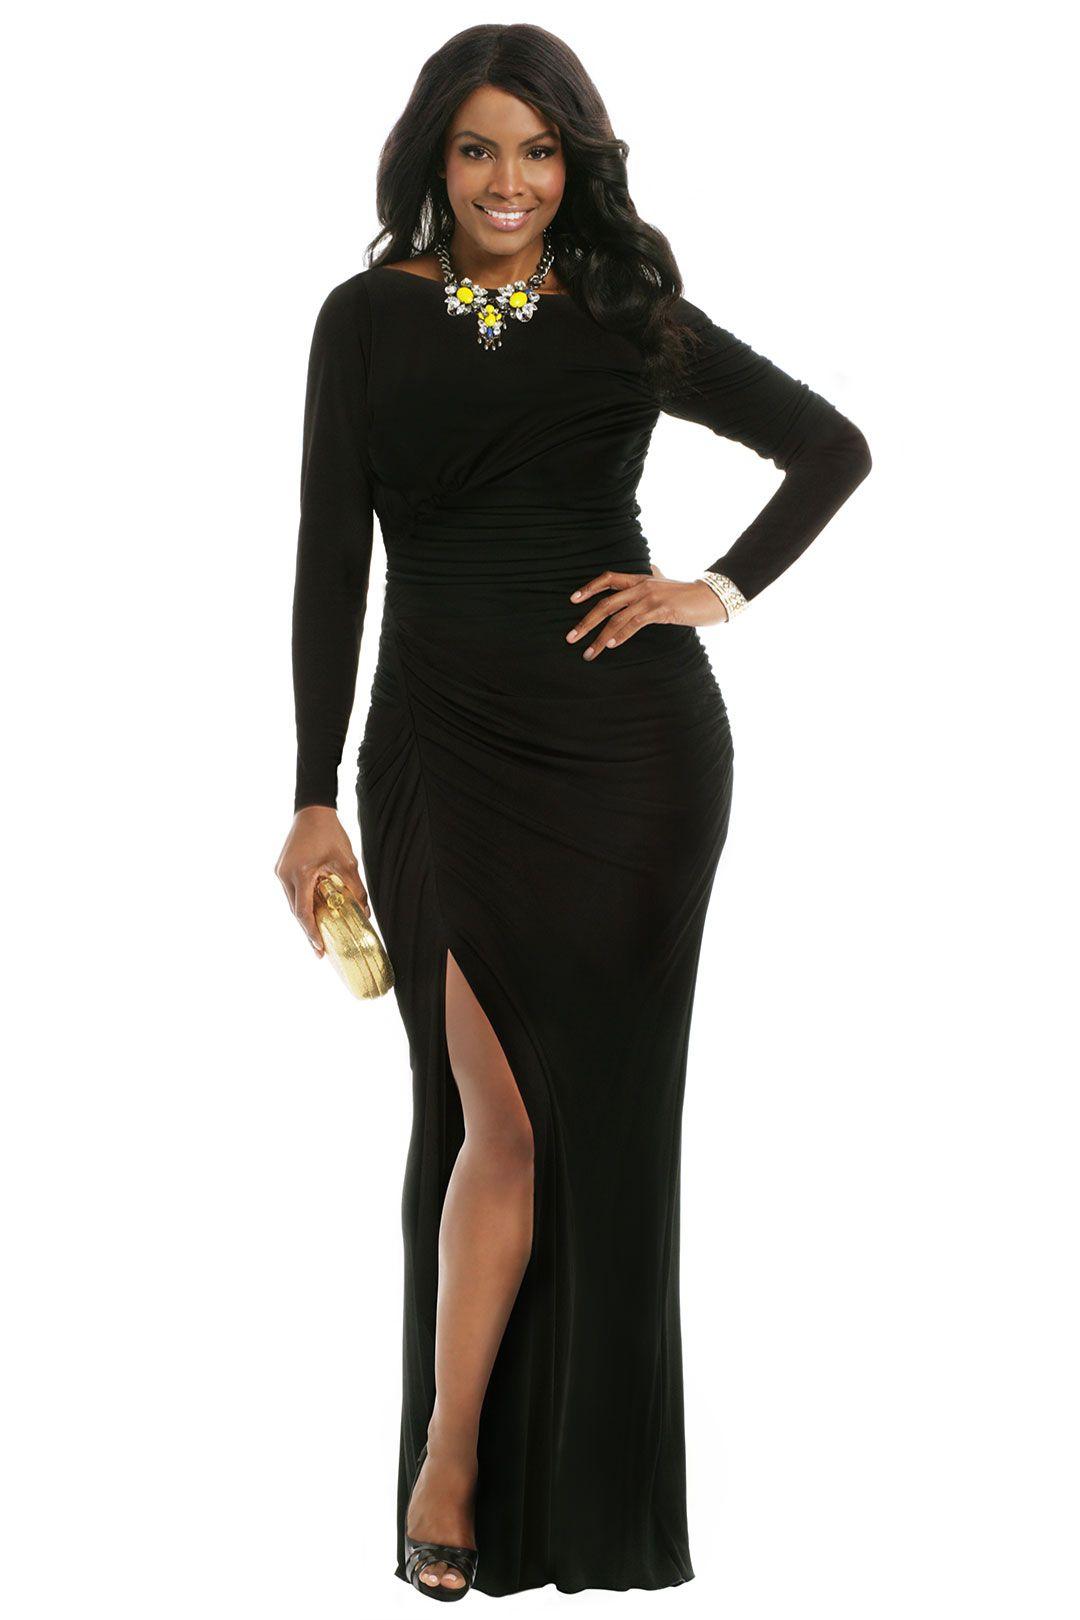 Badgley Mischka Black Sea Gown | FATshionistas - Plus Size Style ...